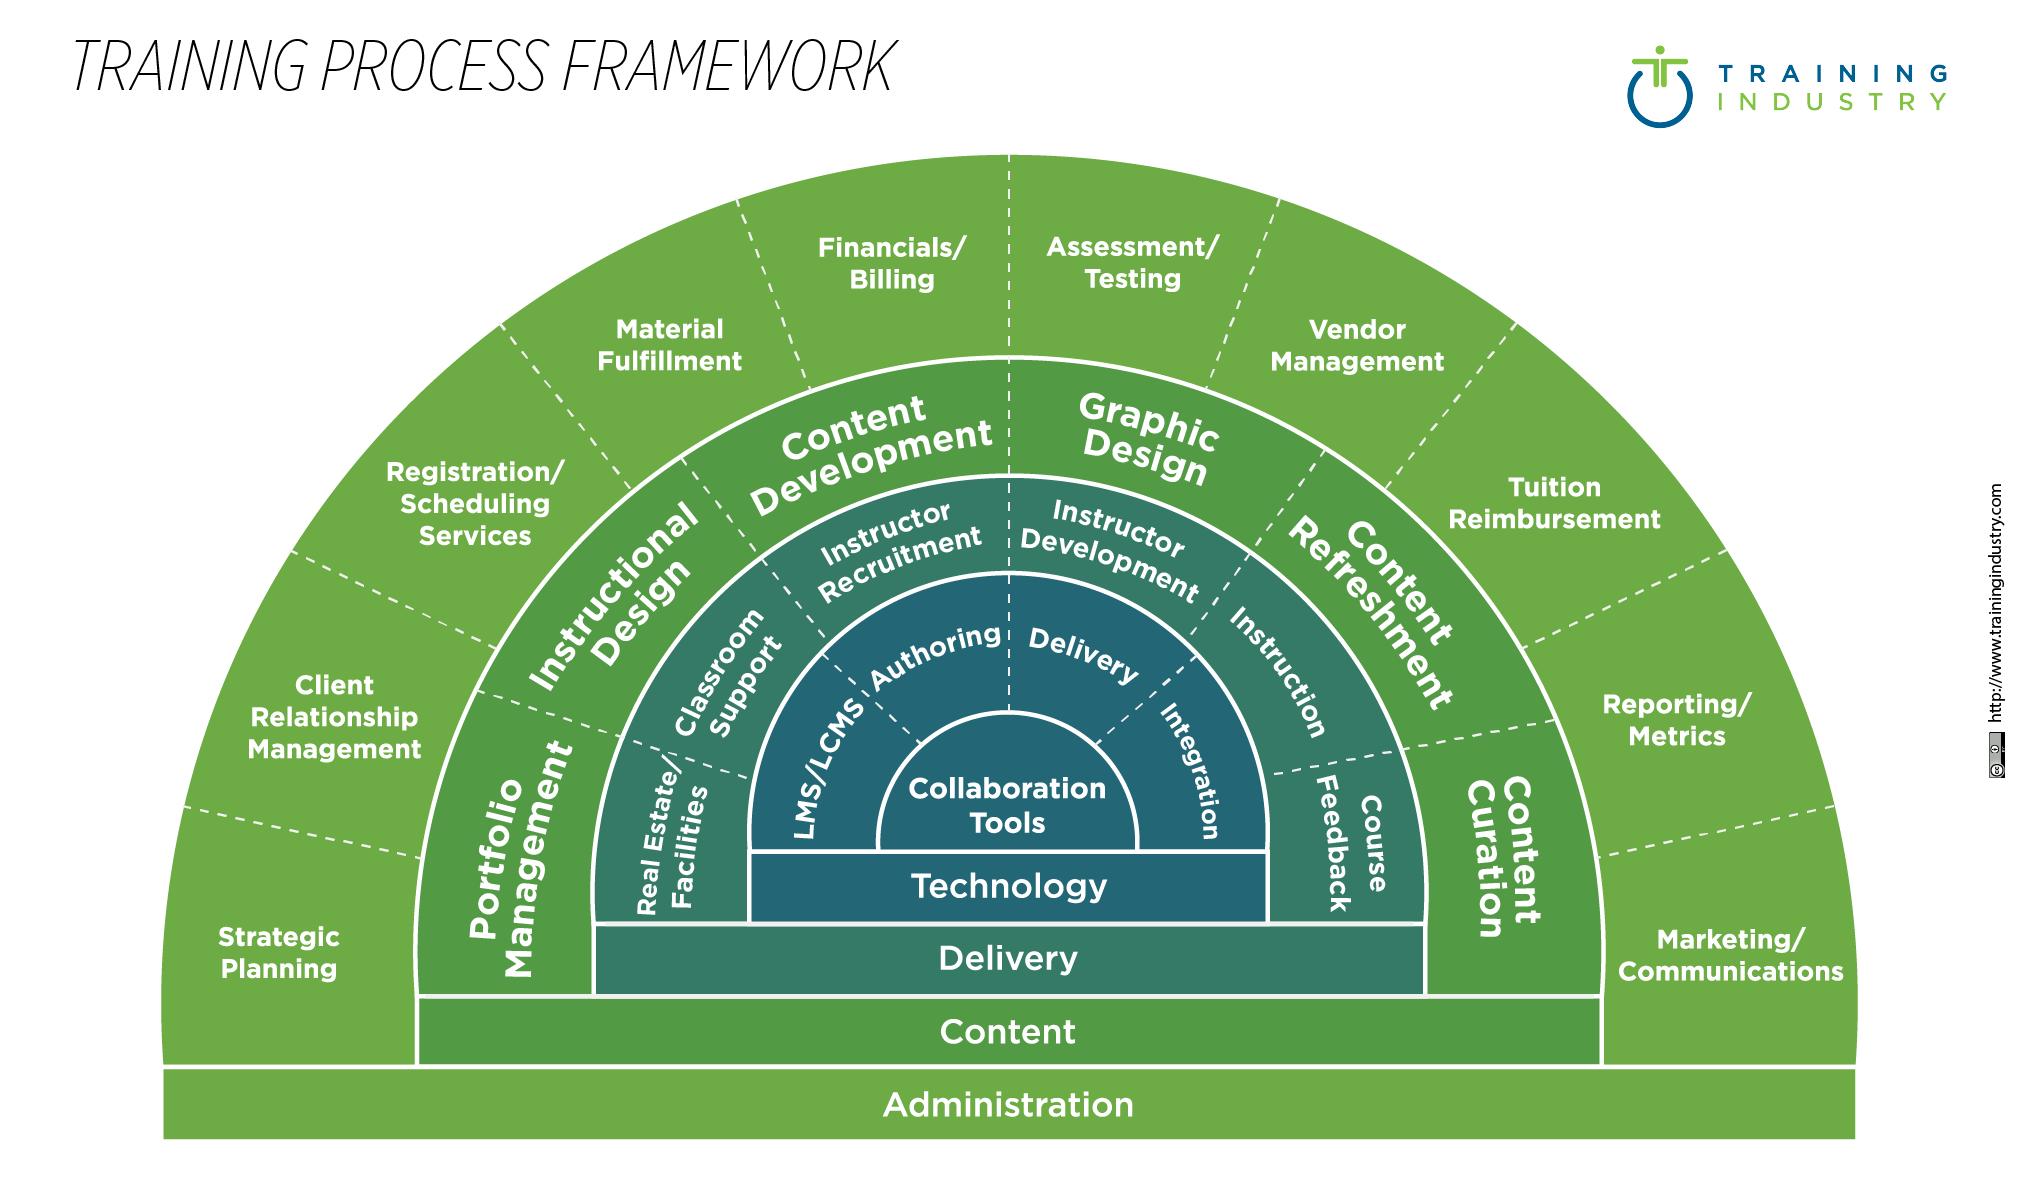 Training Process Framework _485x 284